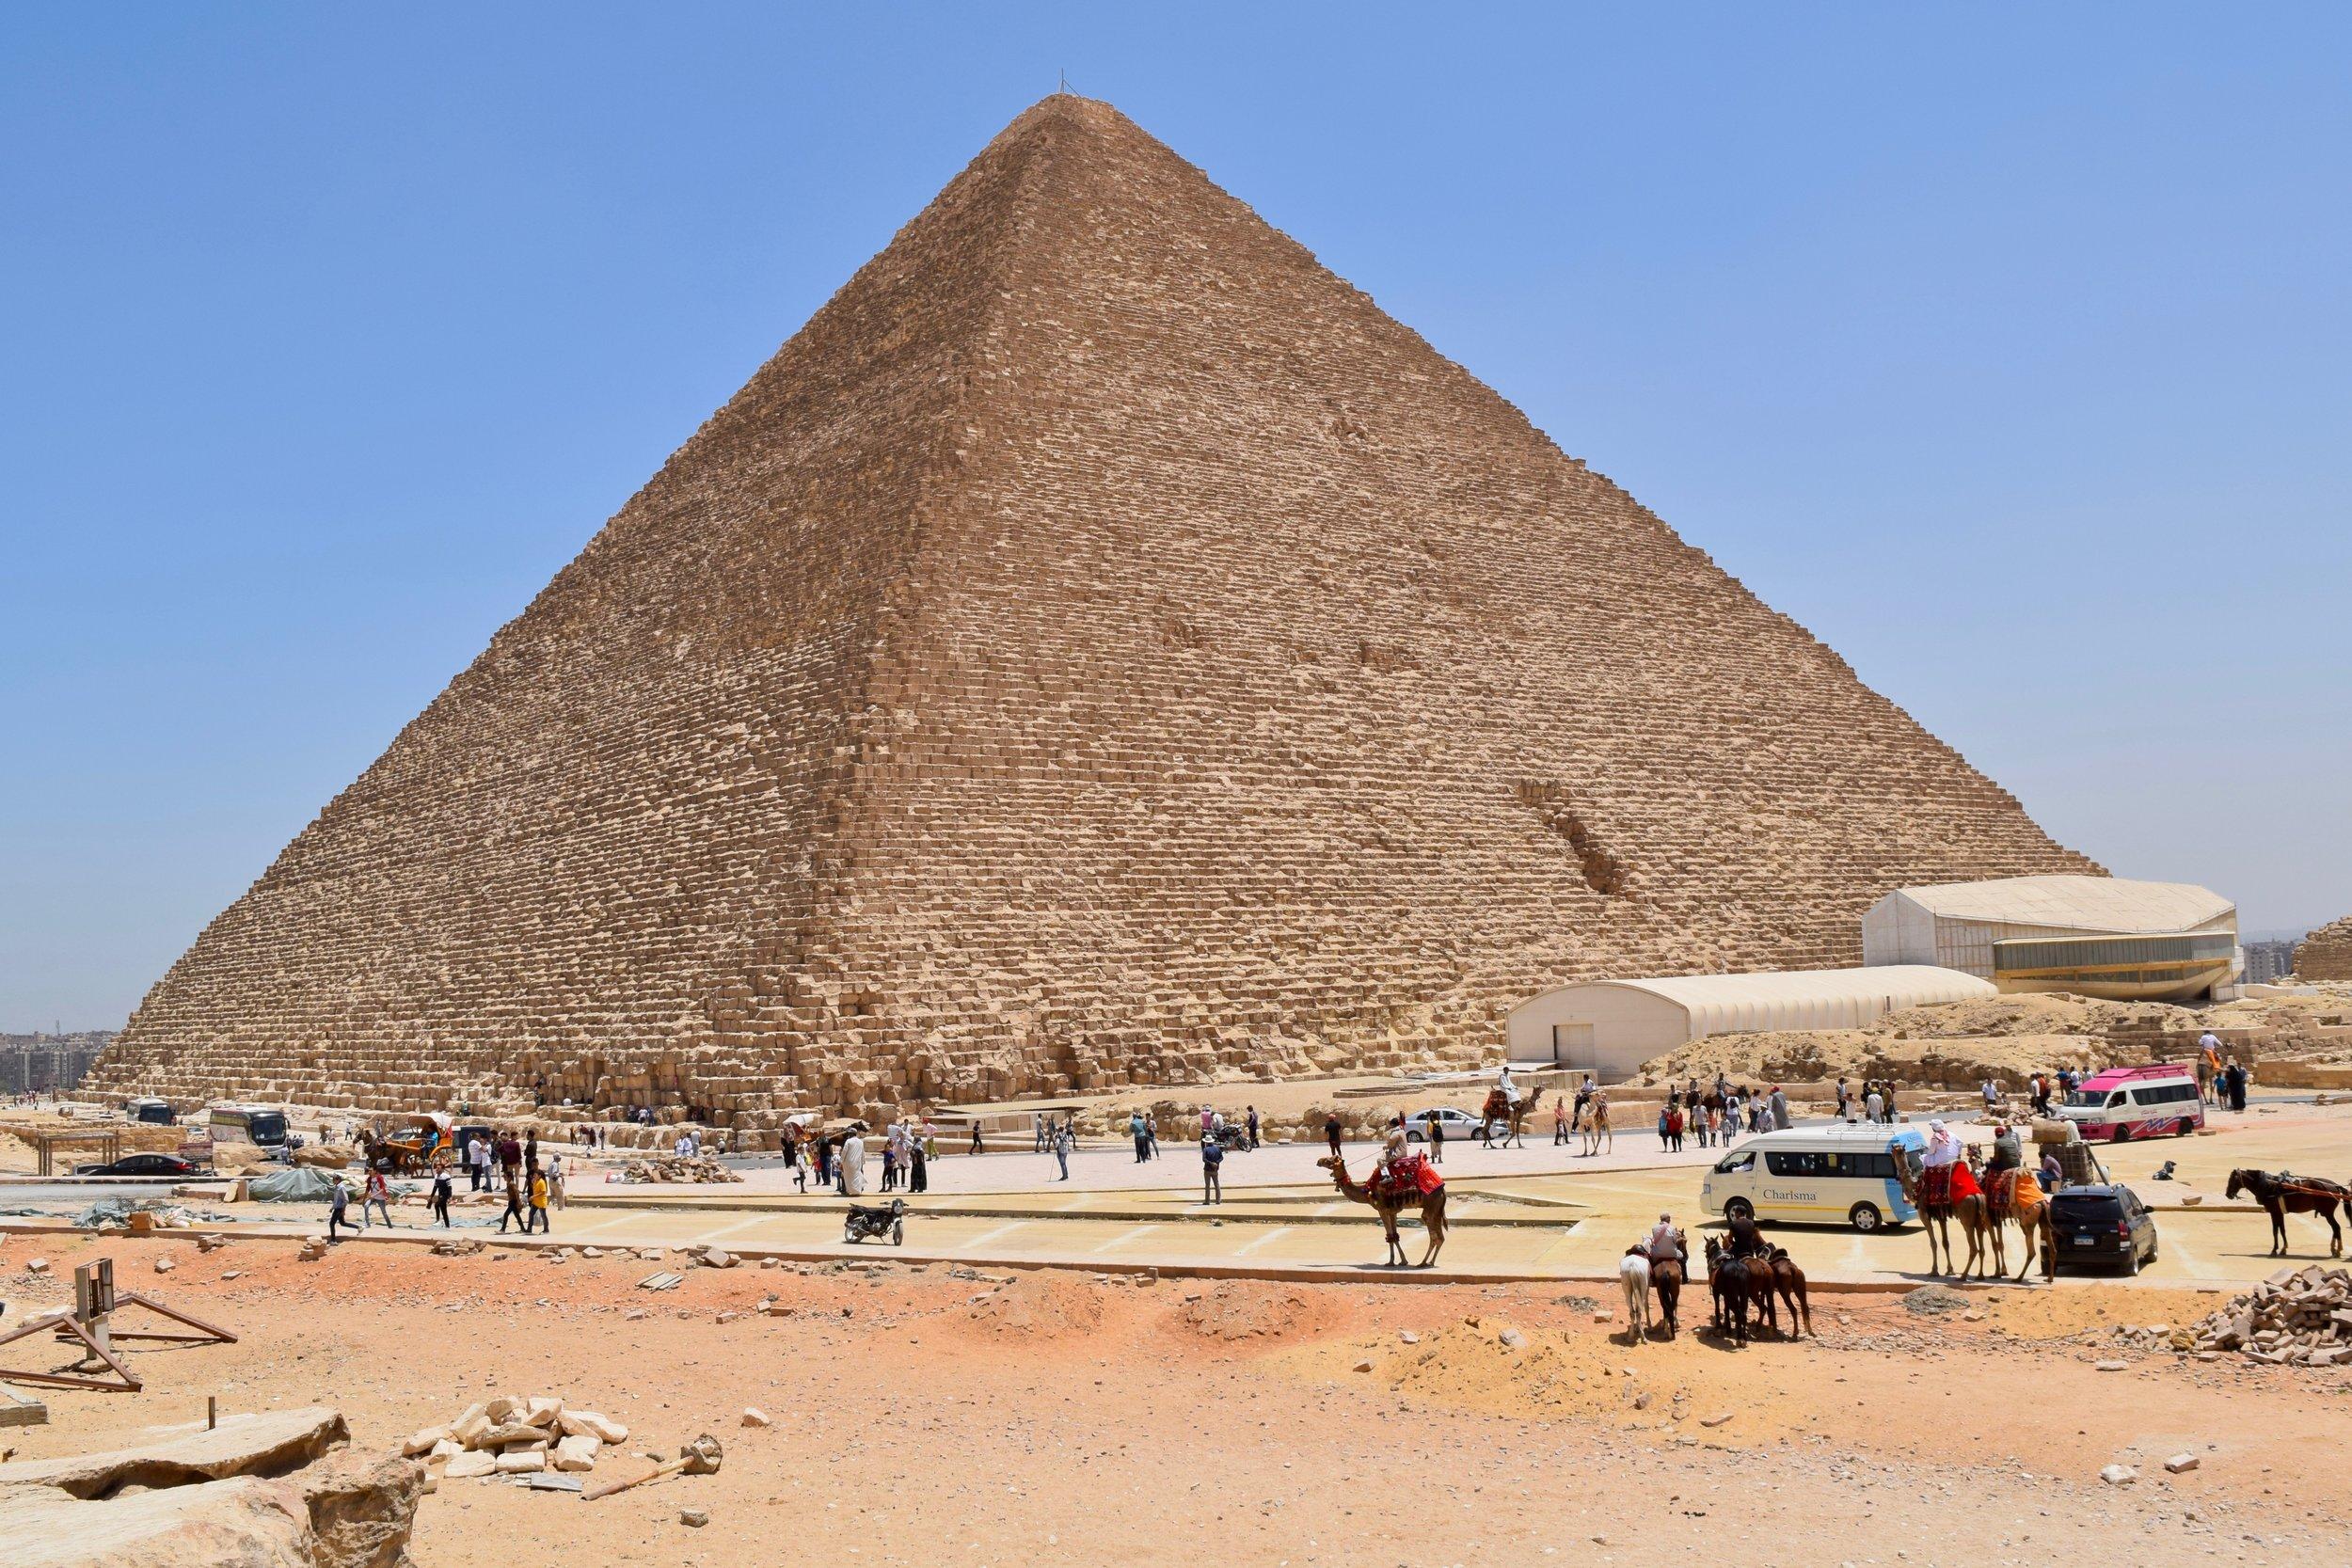 Tourists around the Great Pyramid